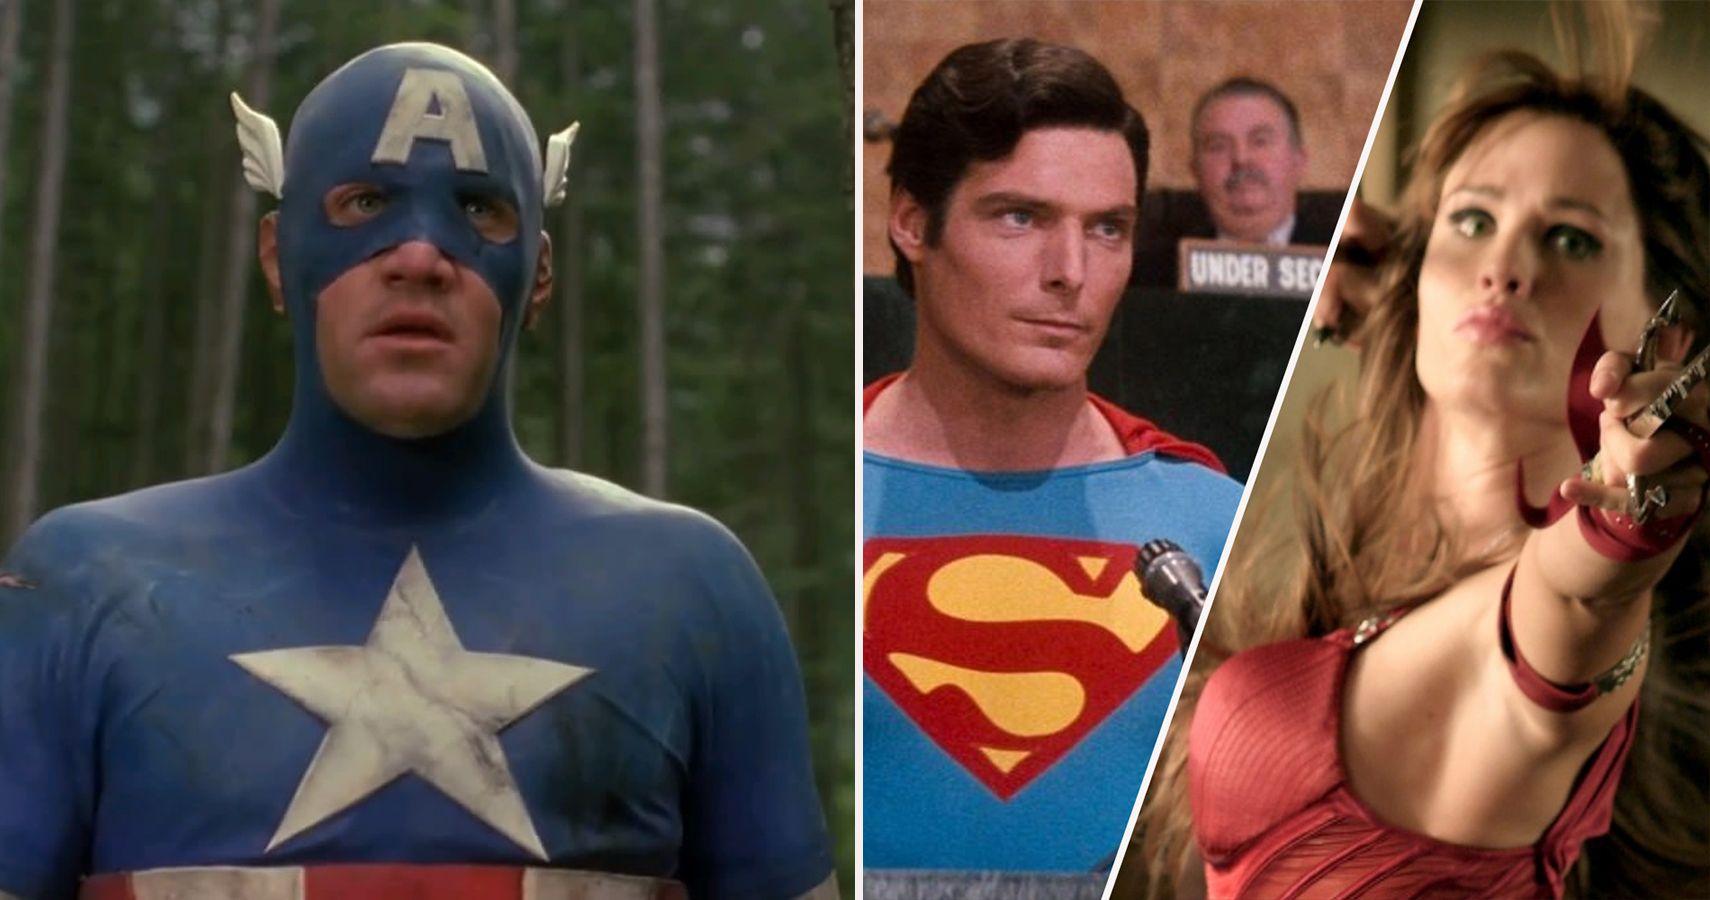 The 15 Worst Superhero Movies According To Rotten Tomatoes ...